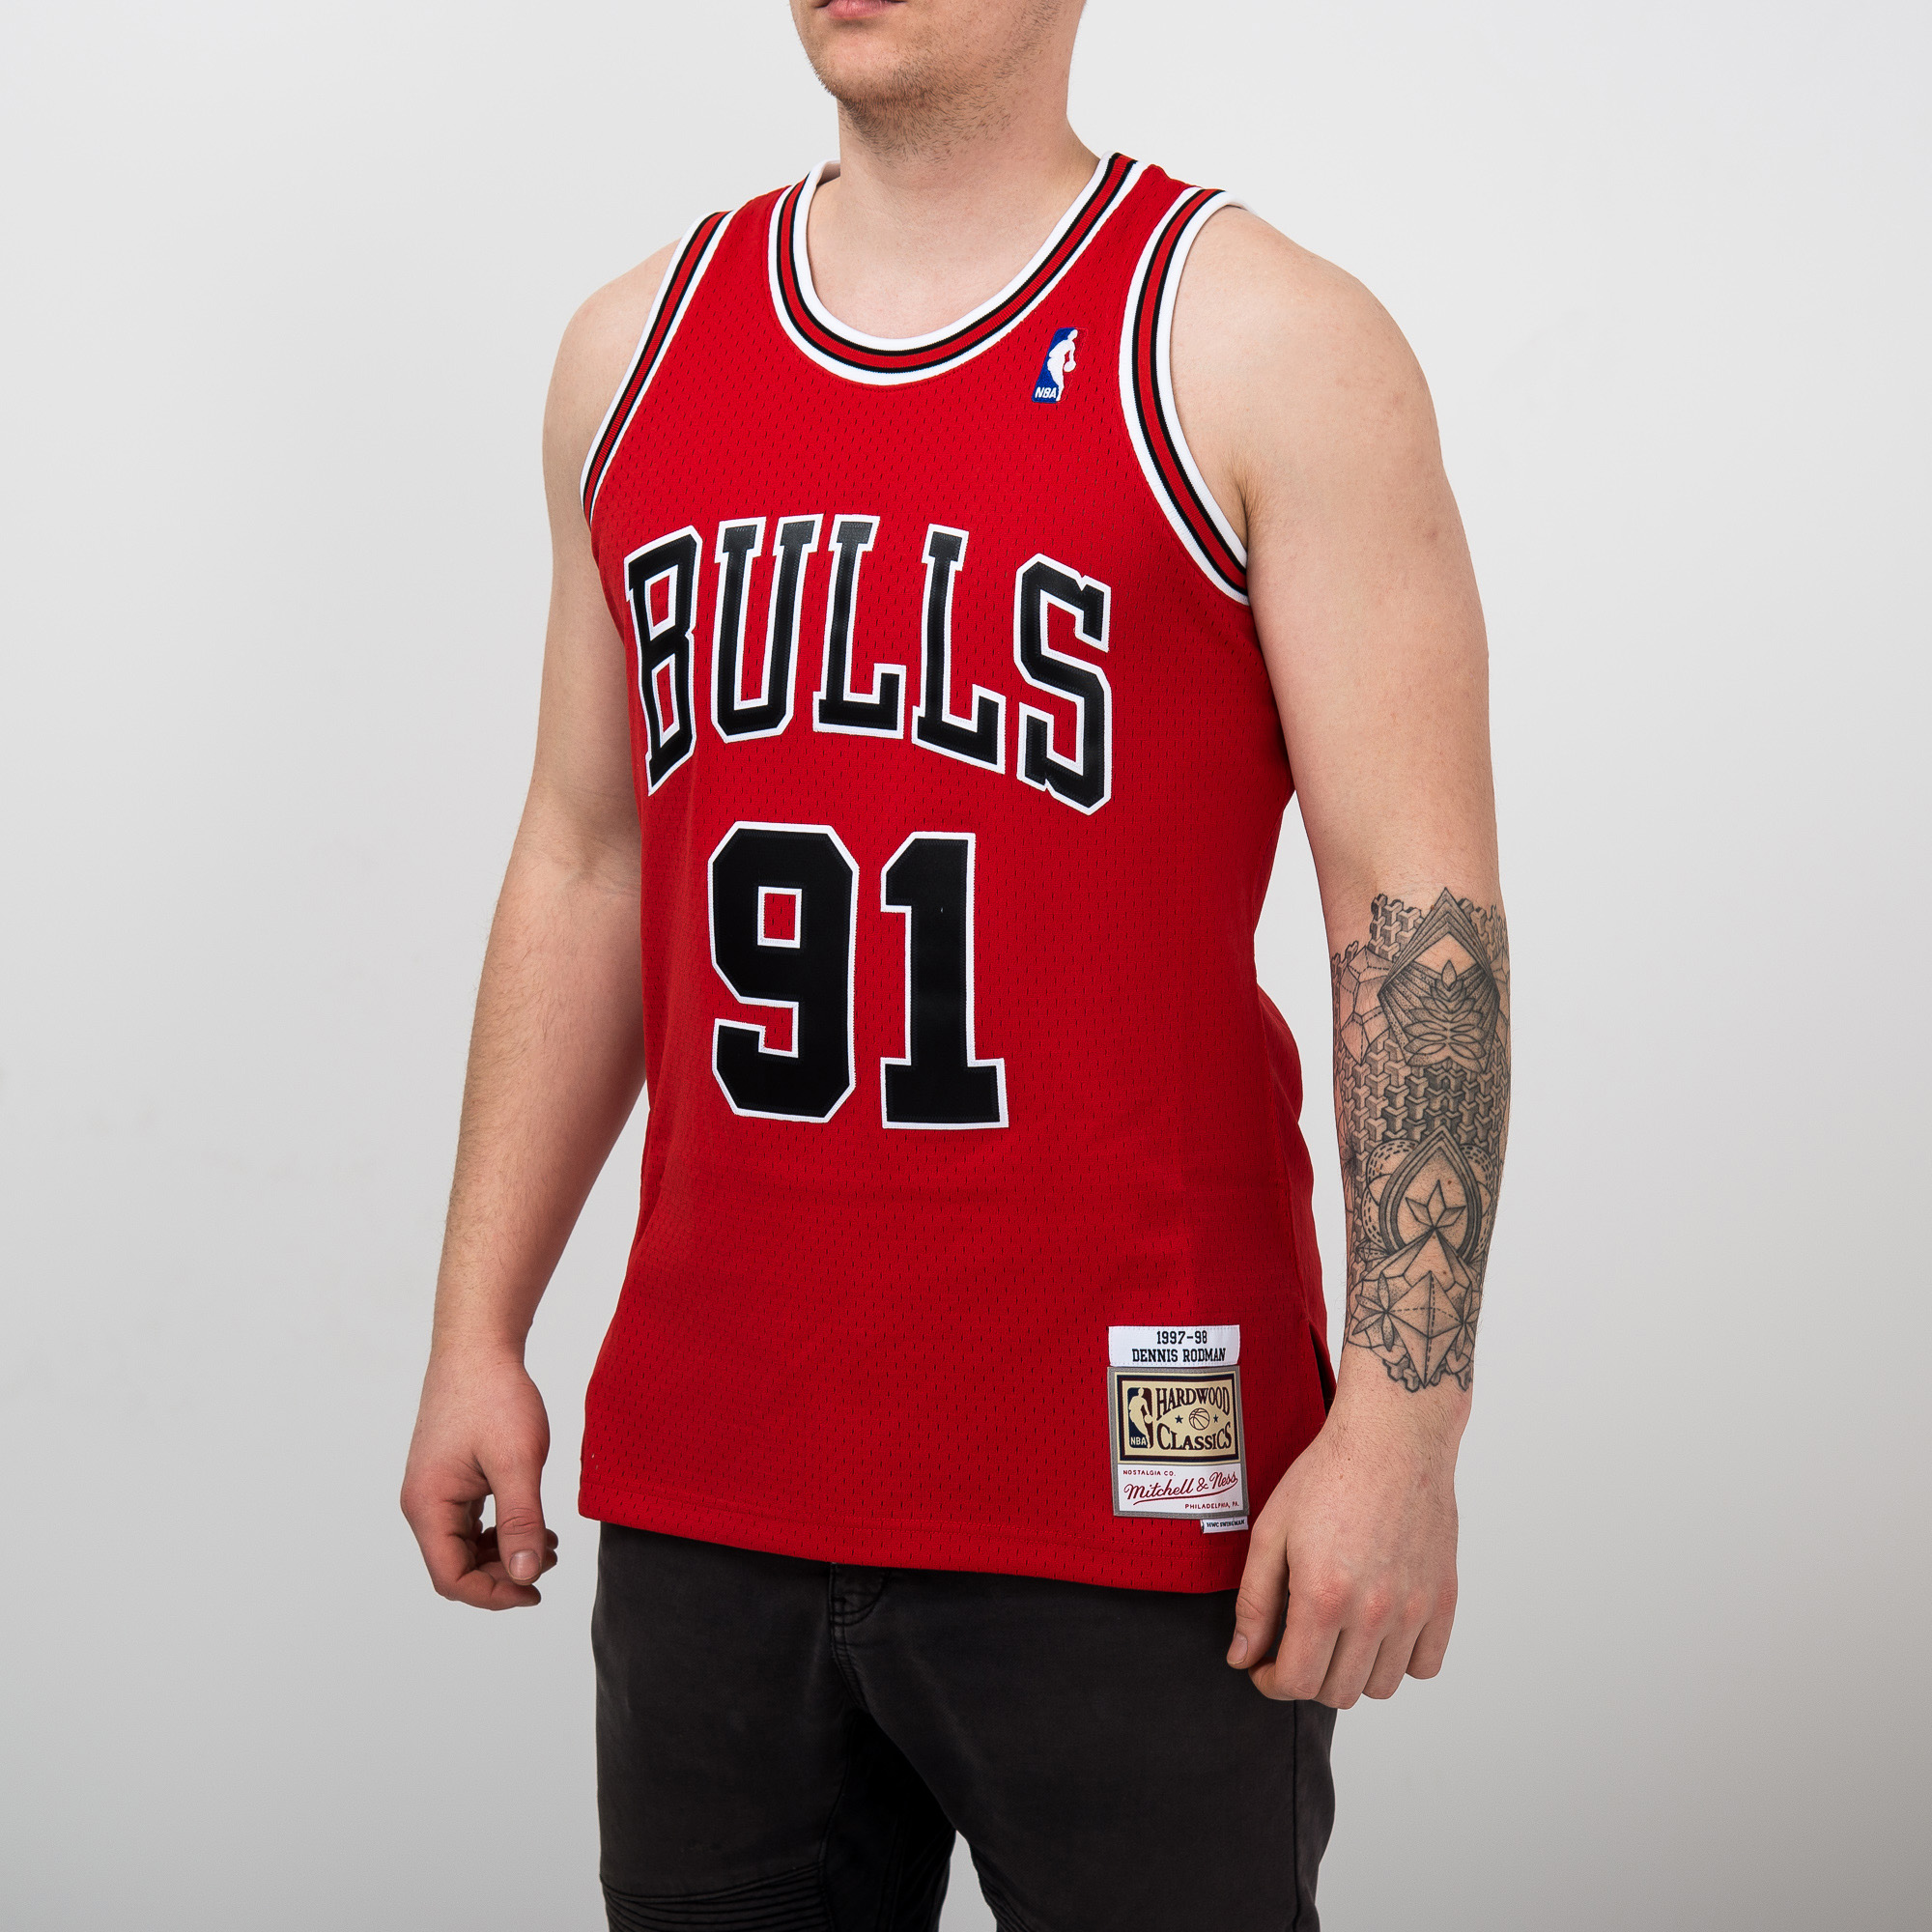 detailing 70ae5 dd9ef Mitchell & Ness NBA Chicago Bulls Dennis Rodman 1997-98 Road ...